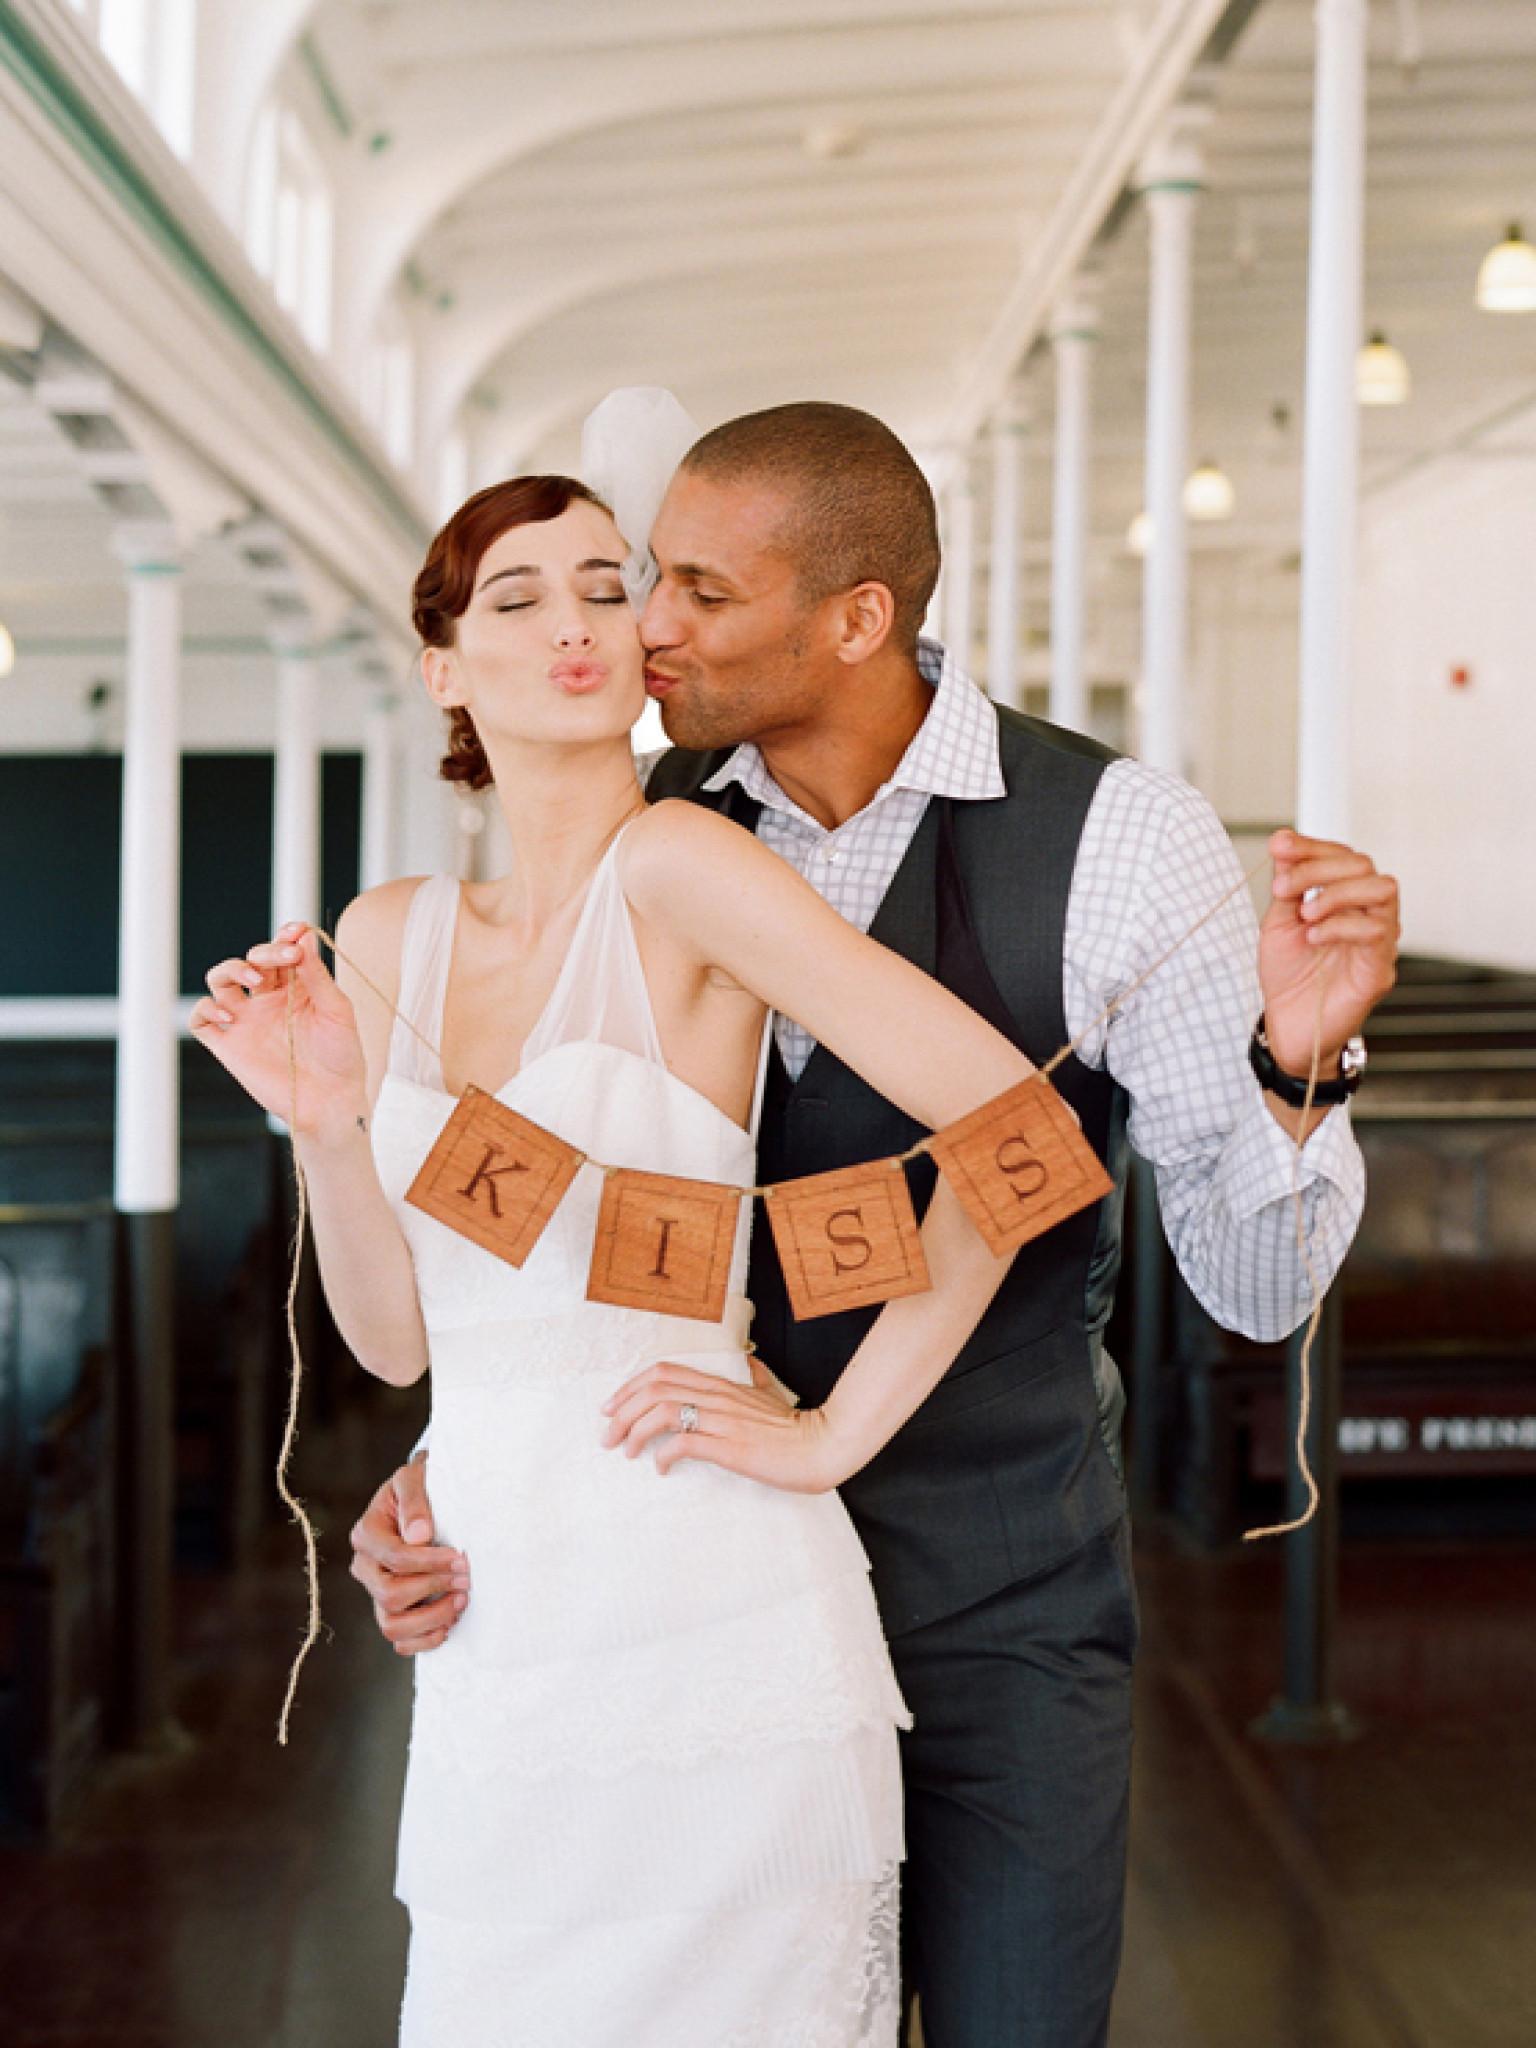 Old Hollywood Wedding Inspiration PHOTOS HuffPost